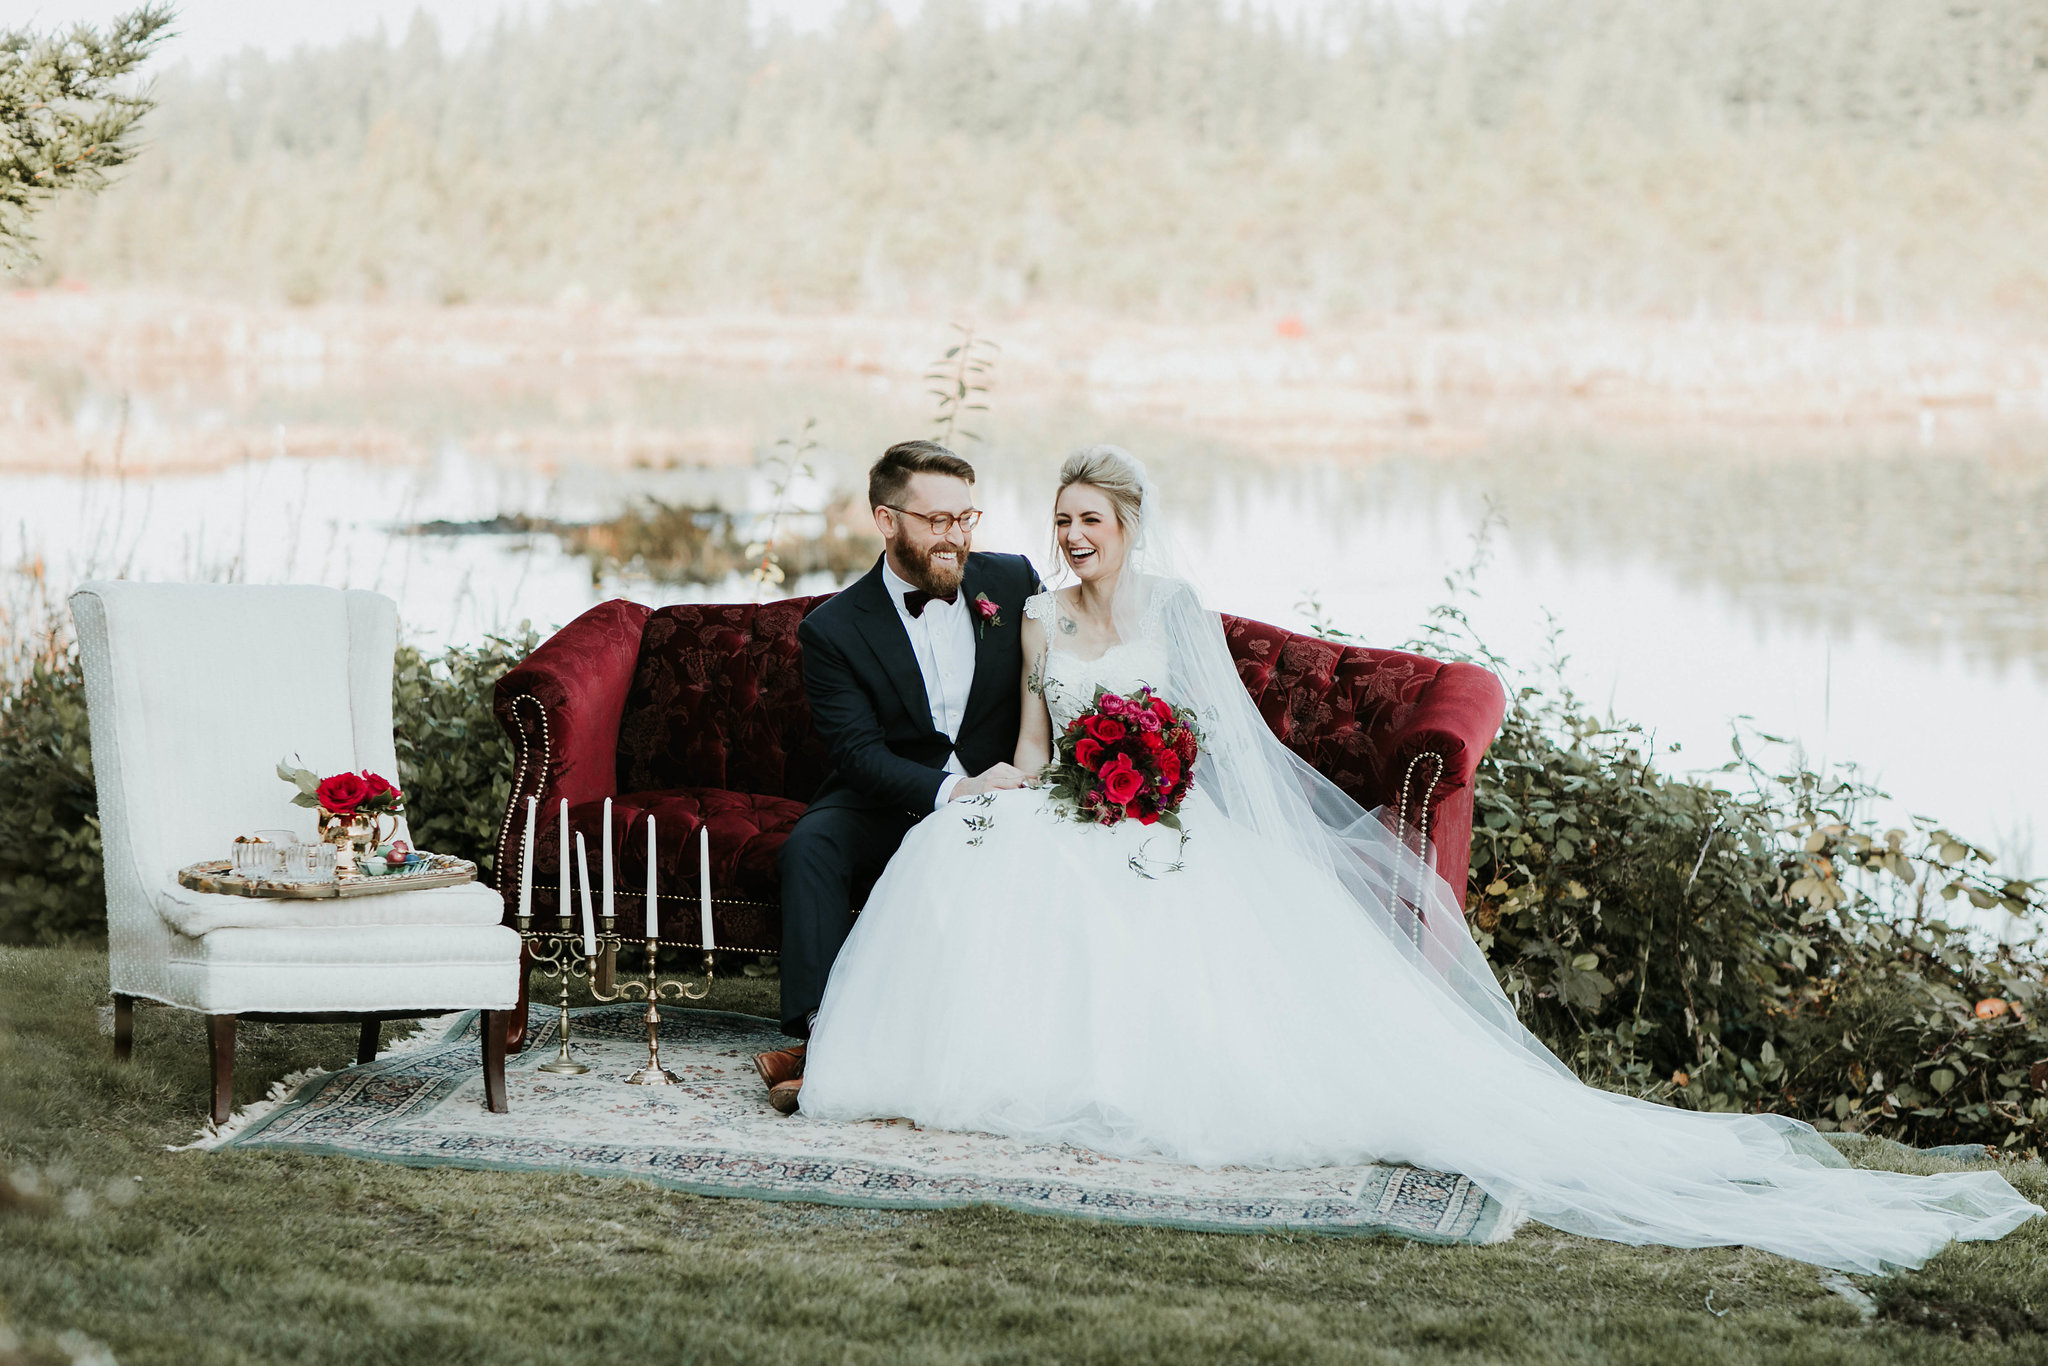 Crystal_Lake_lodge_Wedding_photos_by_Adina_Preston_Weddings_108.JPG